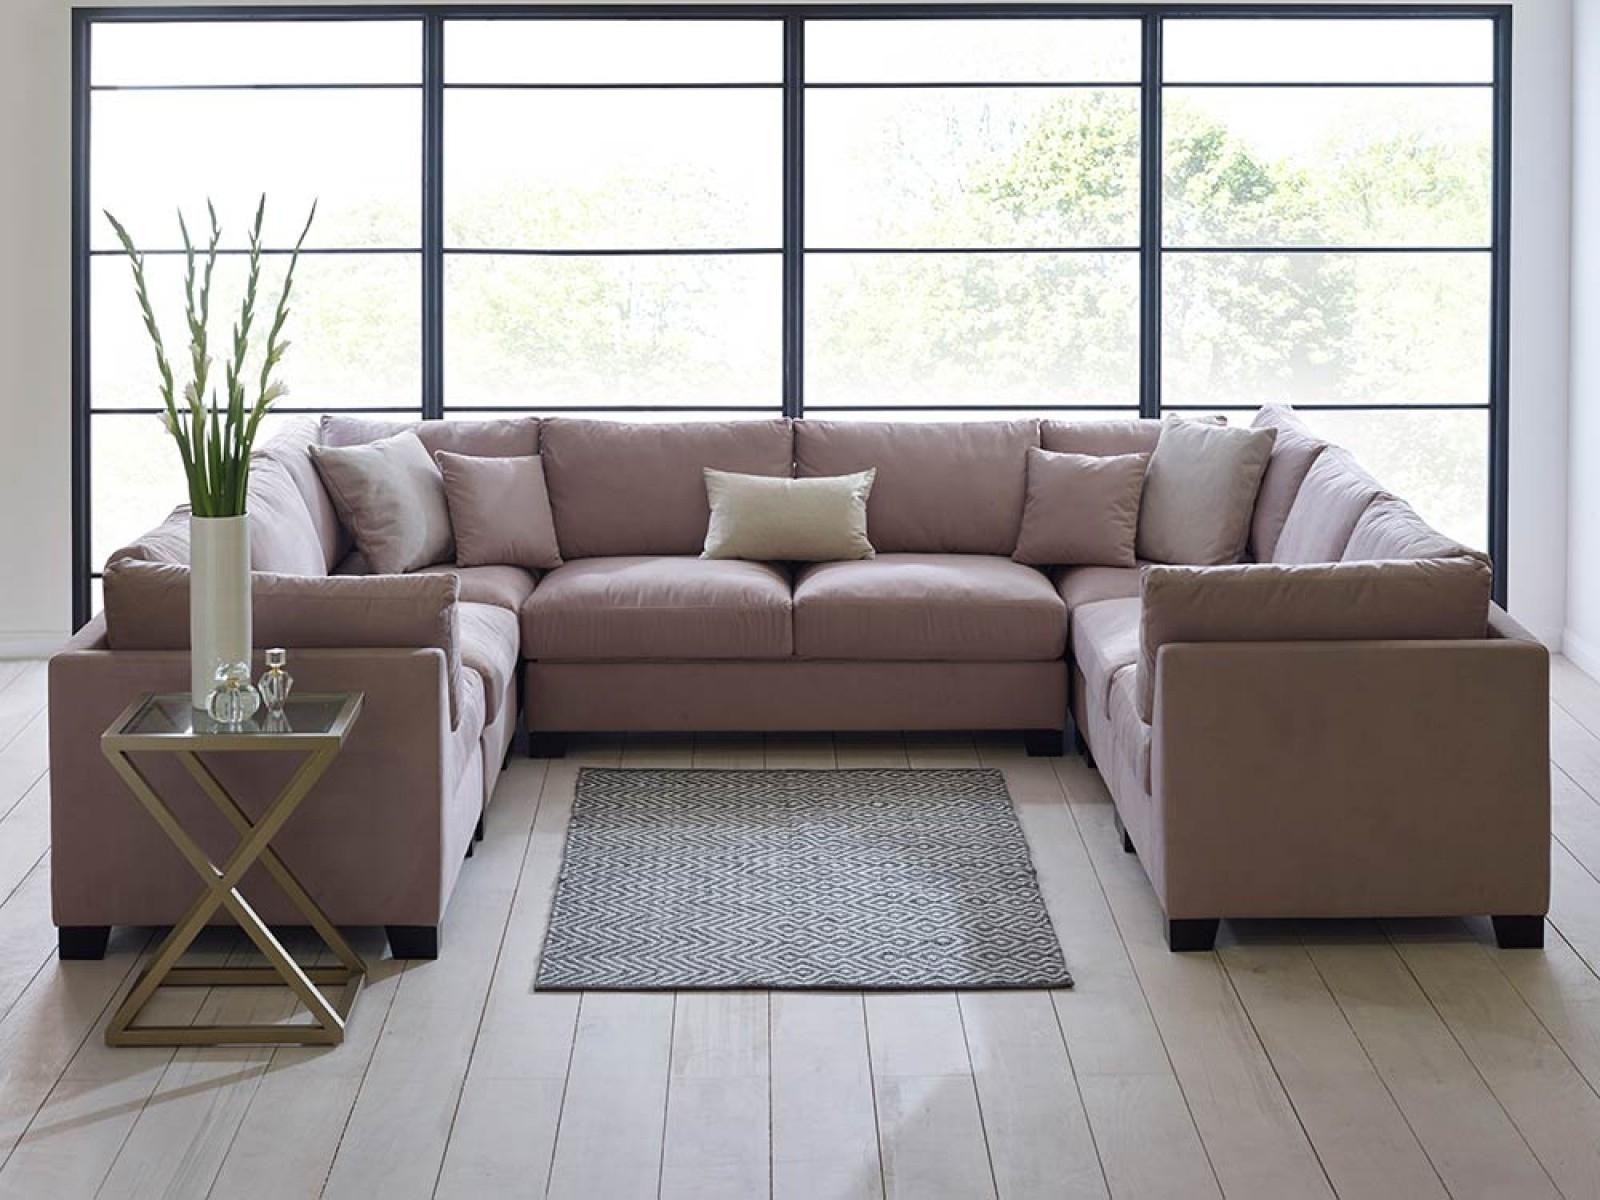 20 Best Of U Shaped Sectional Sofa With Modern U Shaped Sectional Sofas (Gallery 9 of 15)